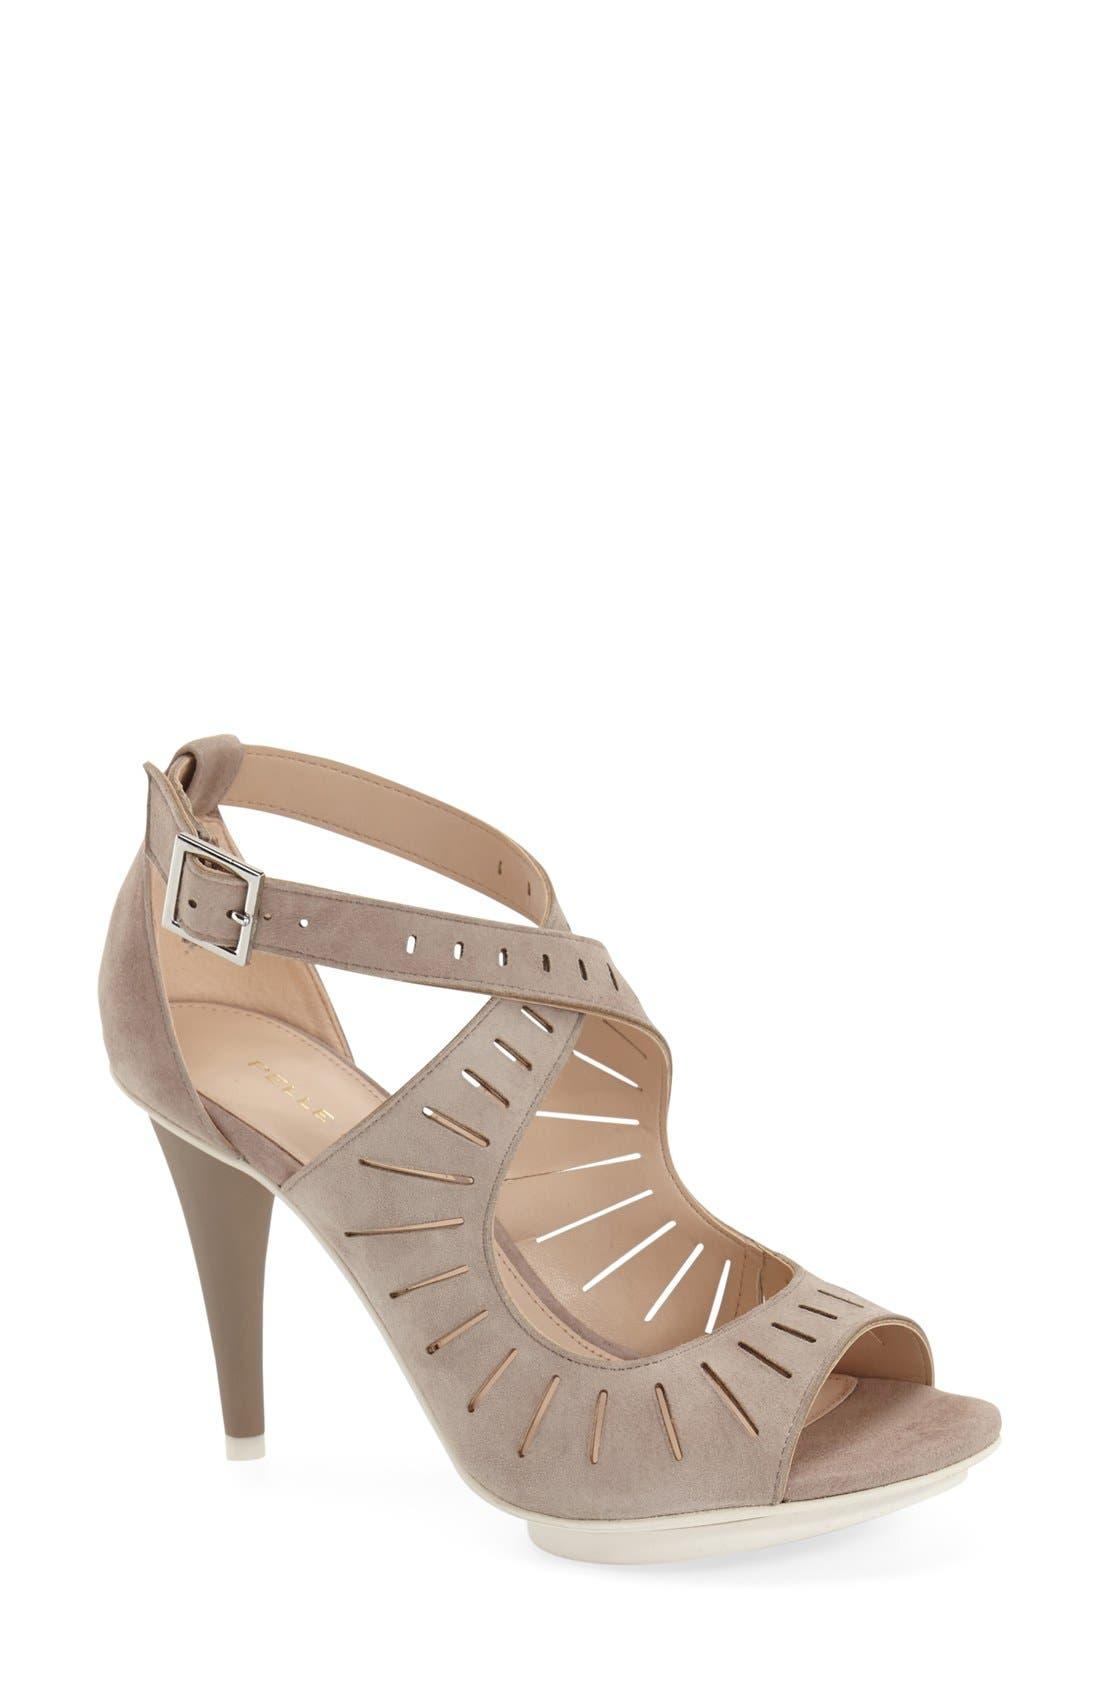 Pelle Moda 'Menlo' Cutout Sandal (Women)